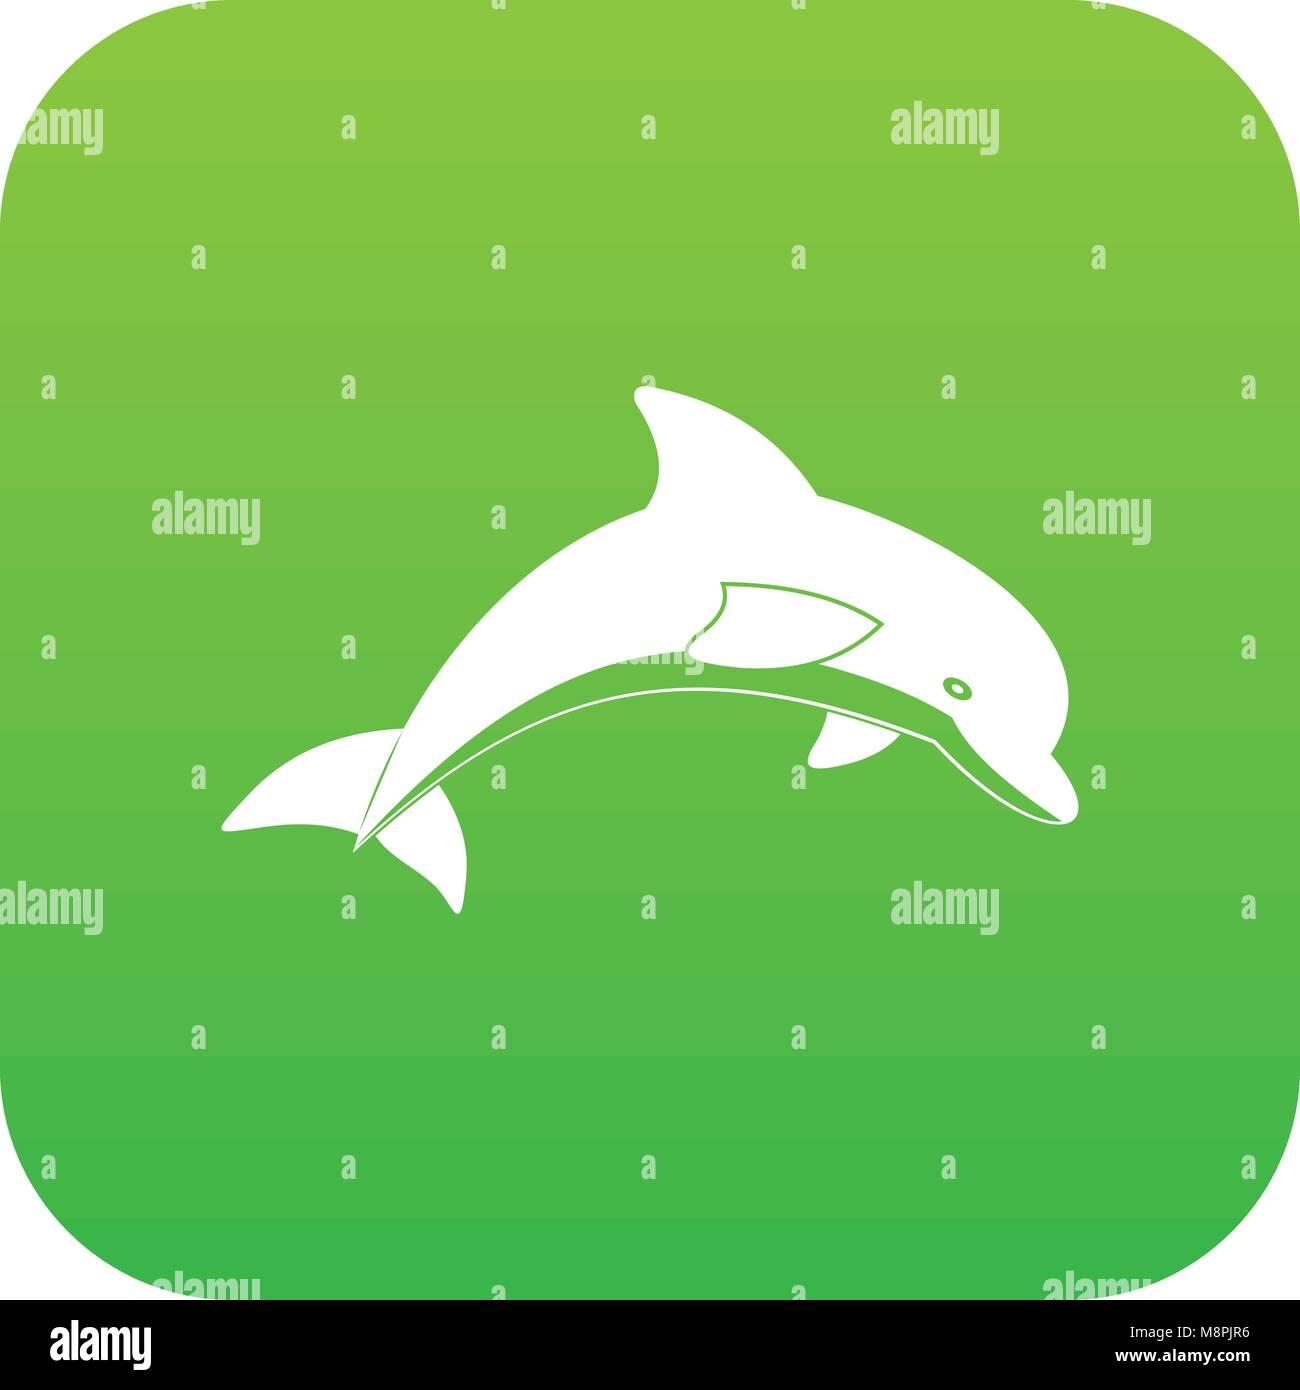 Dolphin Shape Stock Photos & Dolphin Shape Stock Images - Alamy